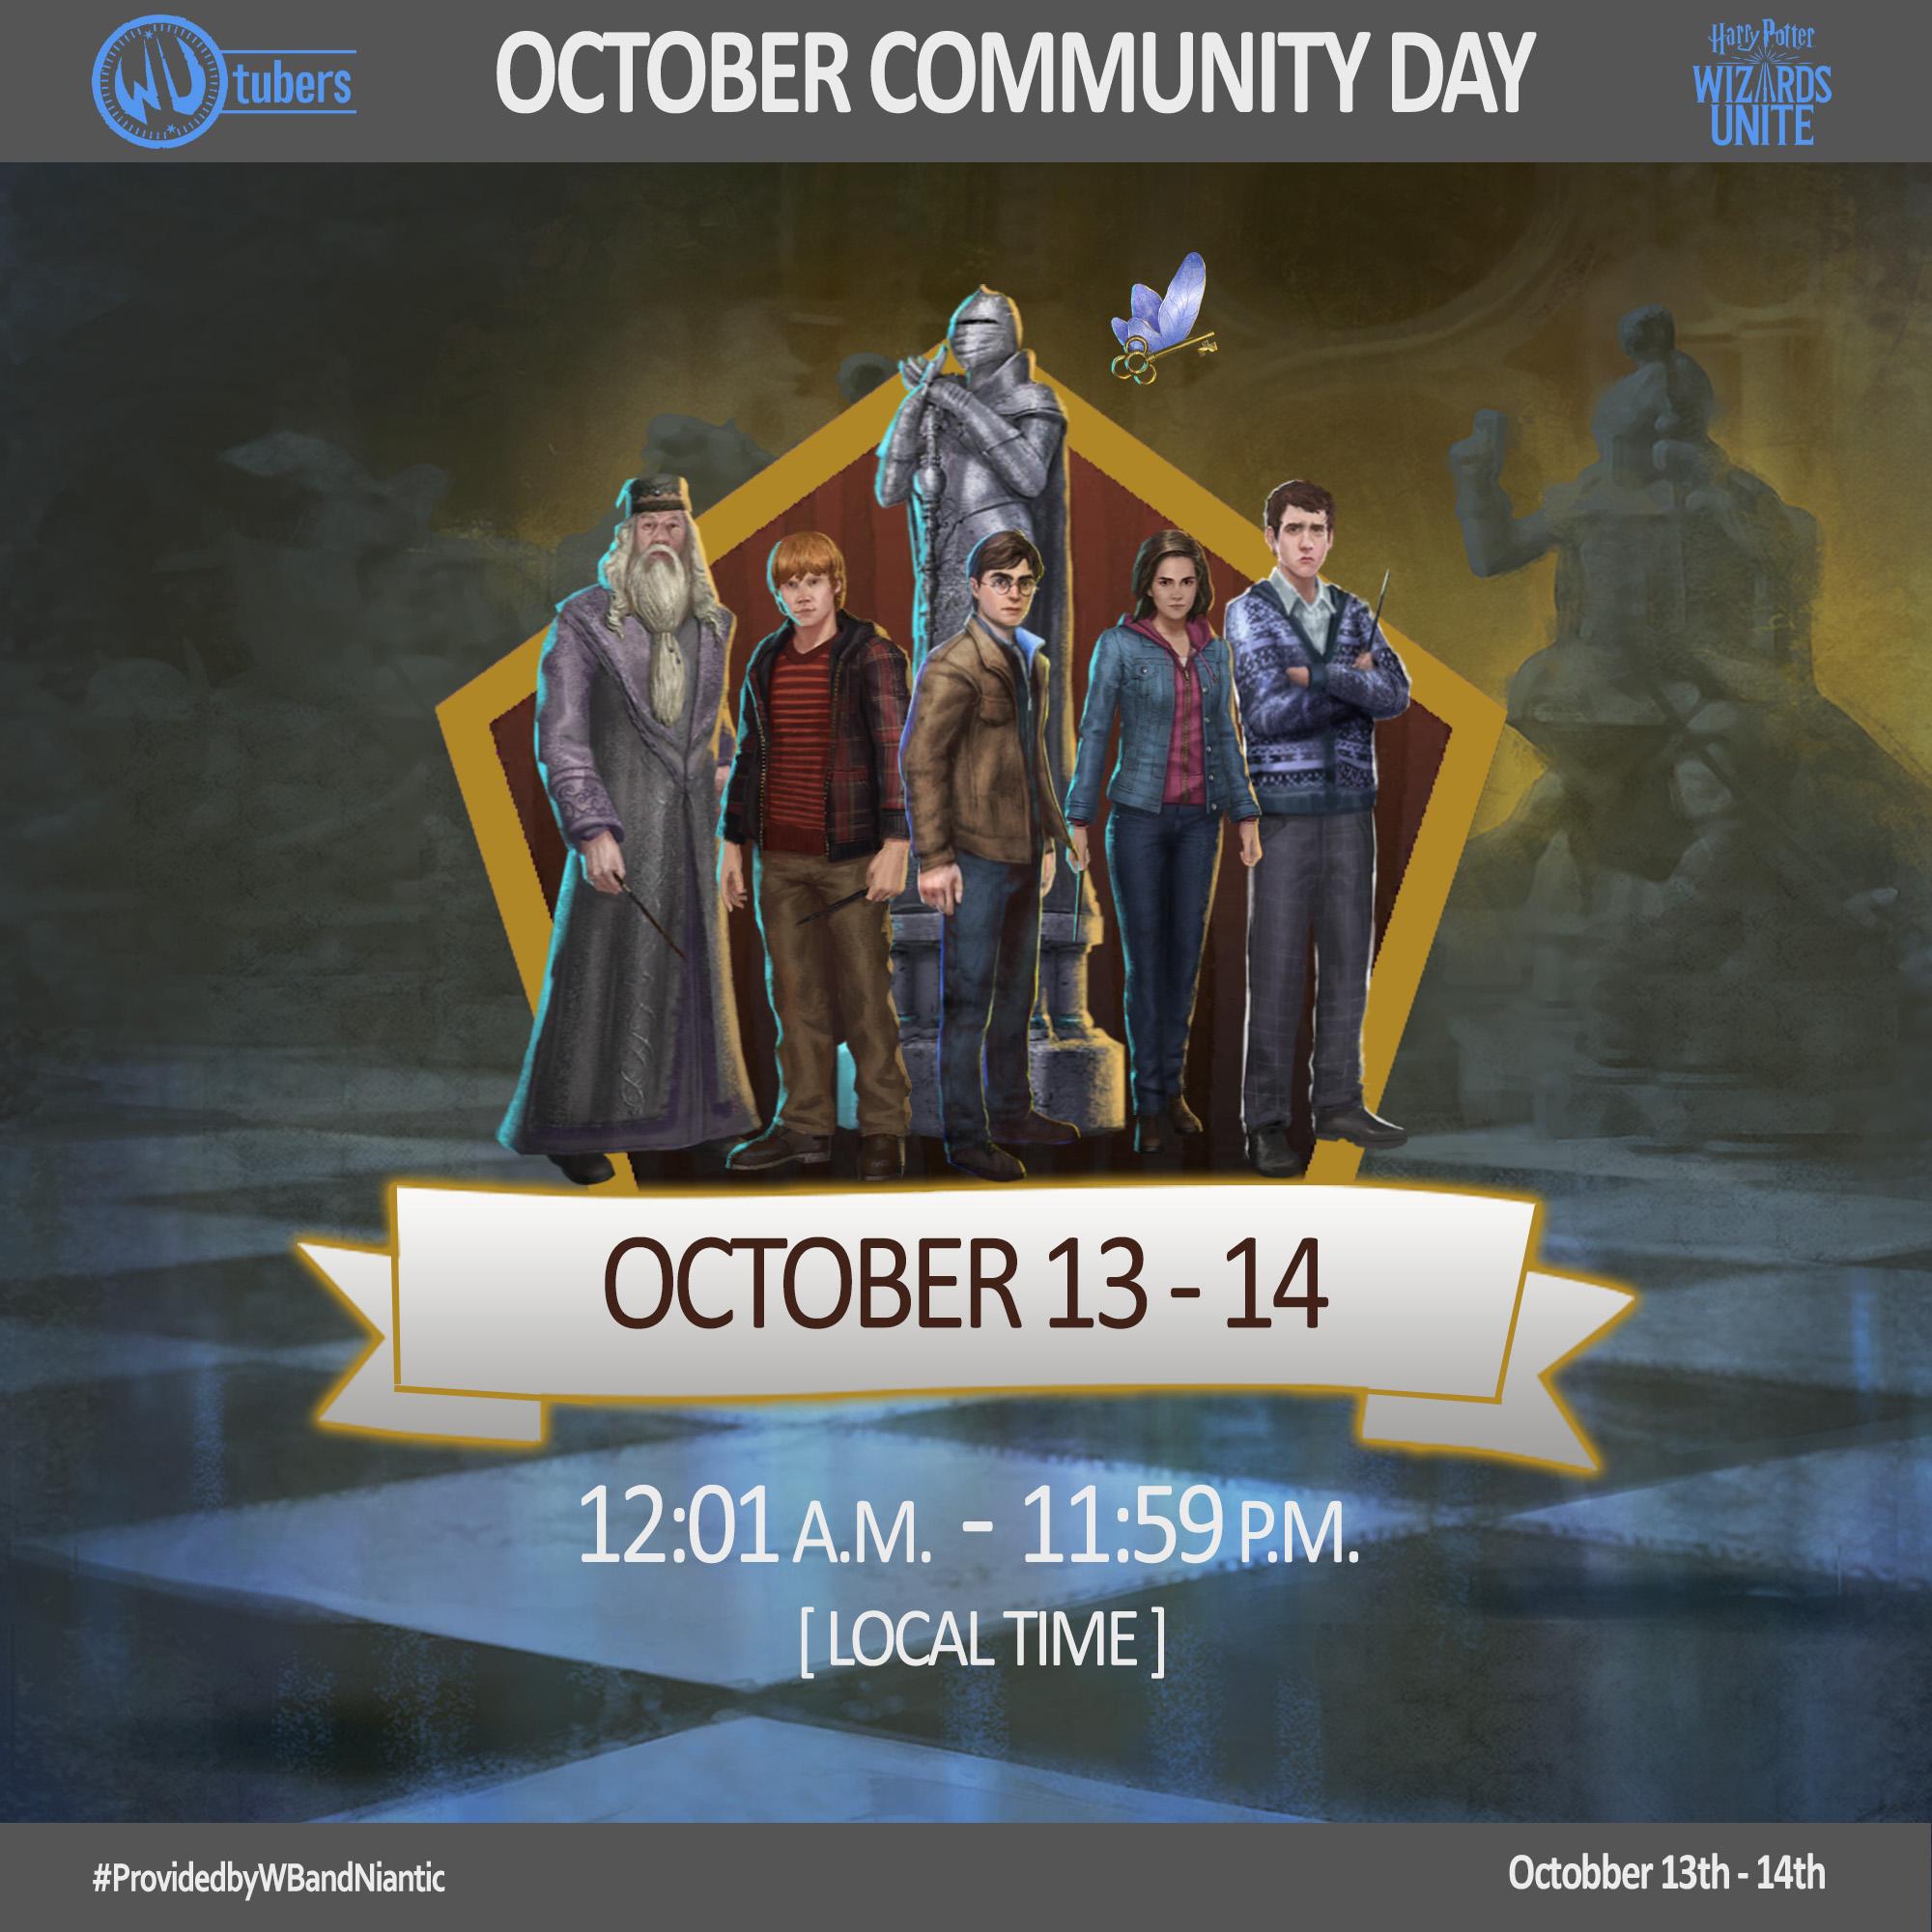 October_Community_Day_Date.jpg